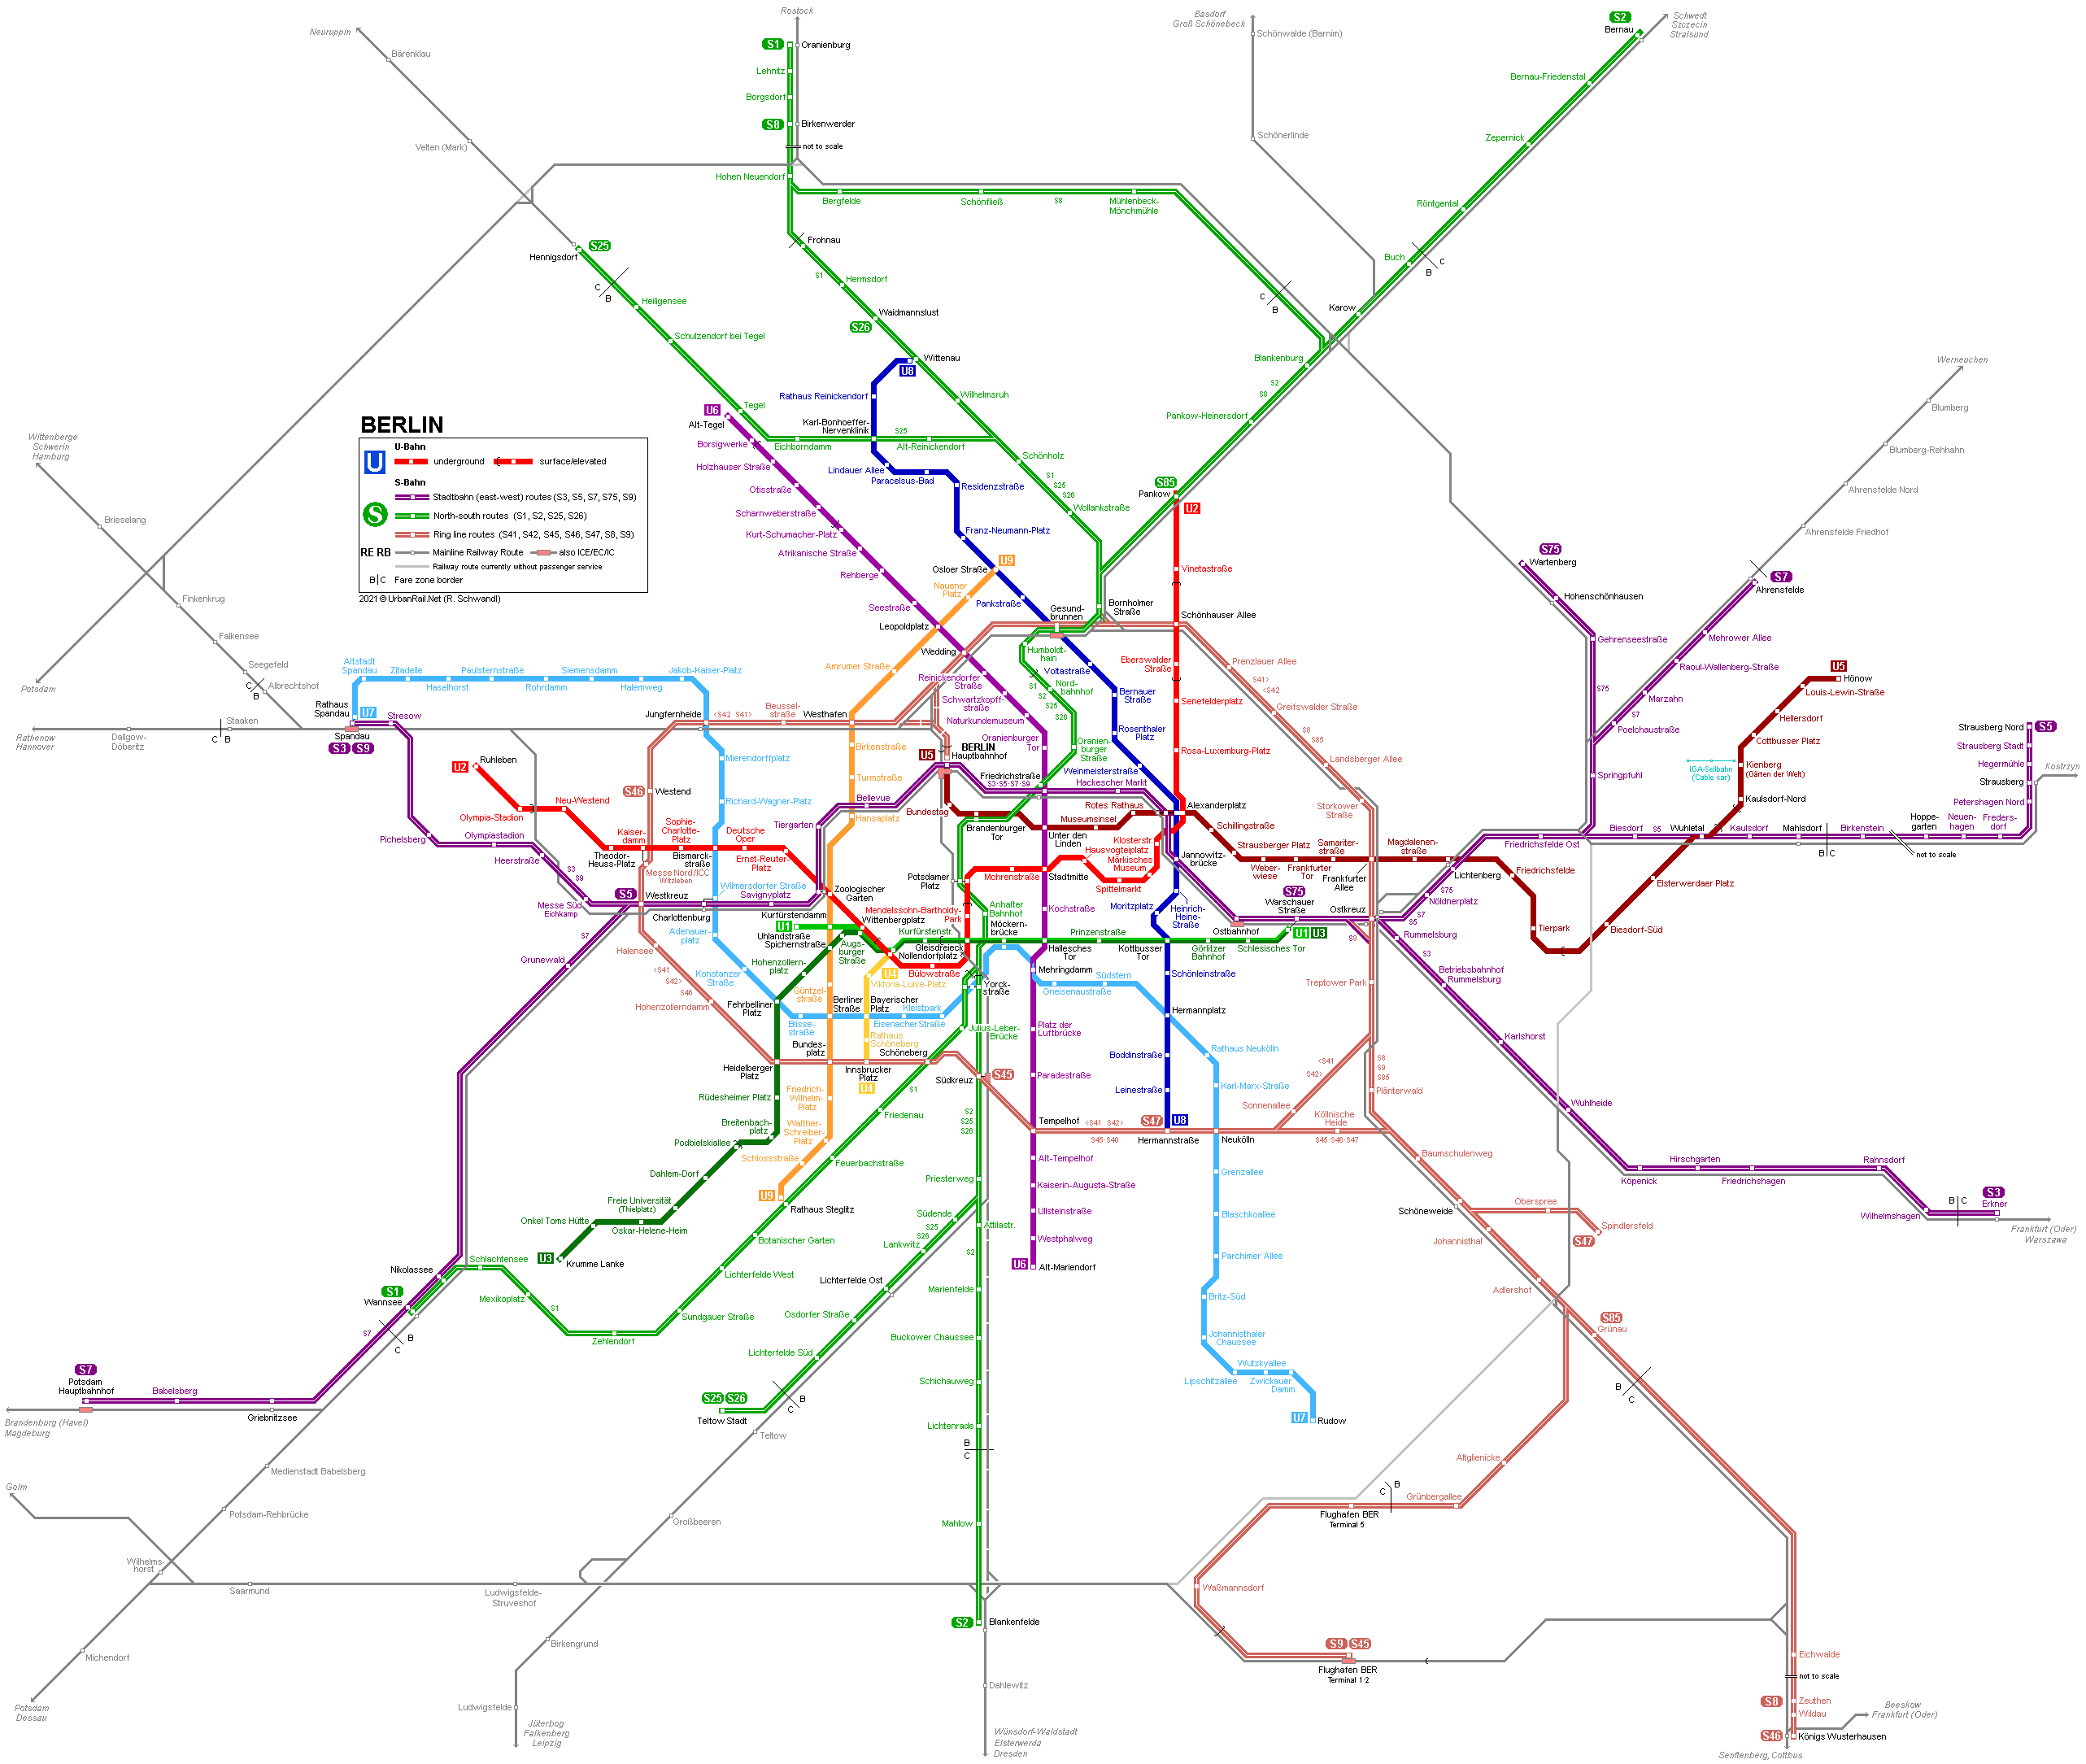 Karta Berlin Bvg.Berlin U Bahn S Bahn Network Map Netzplan